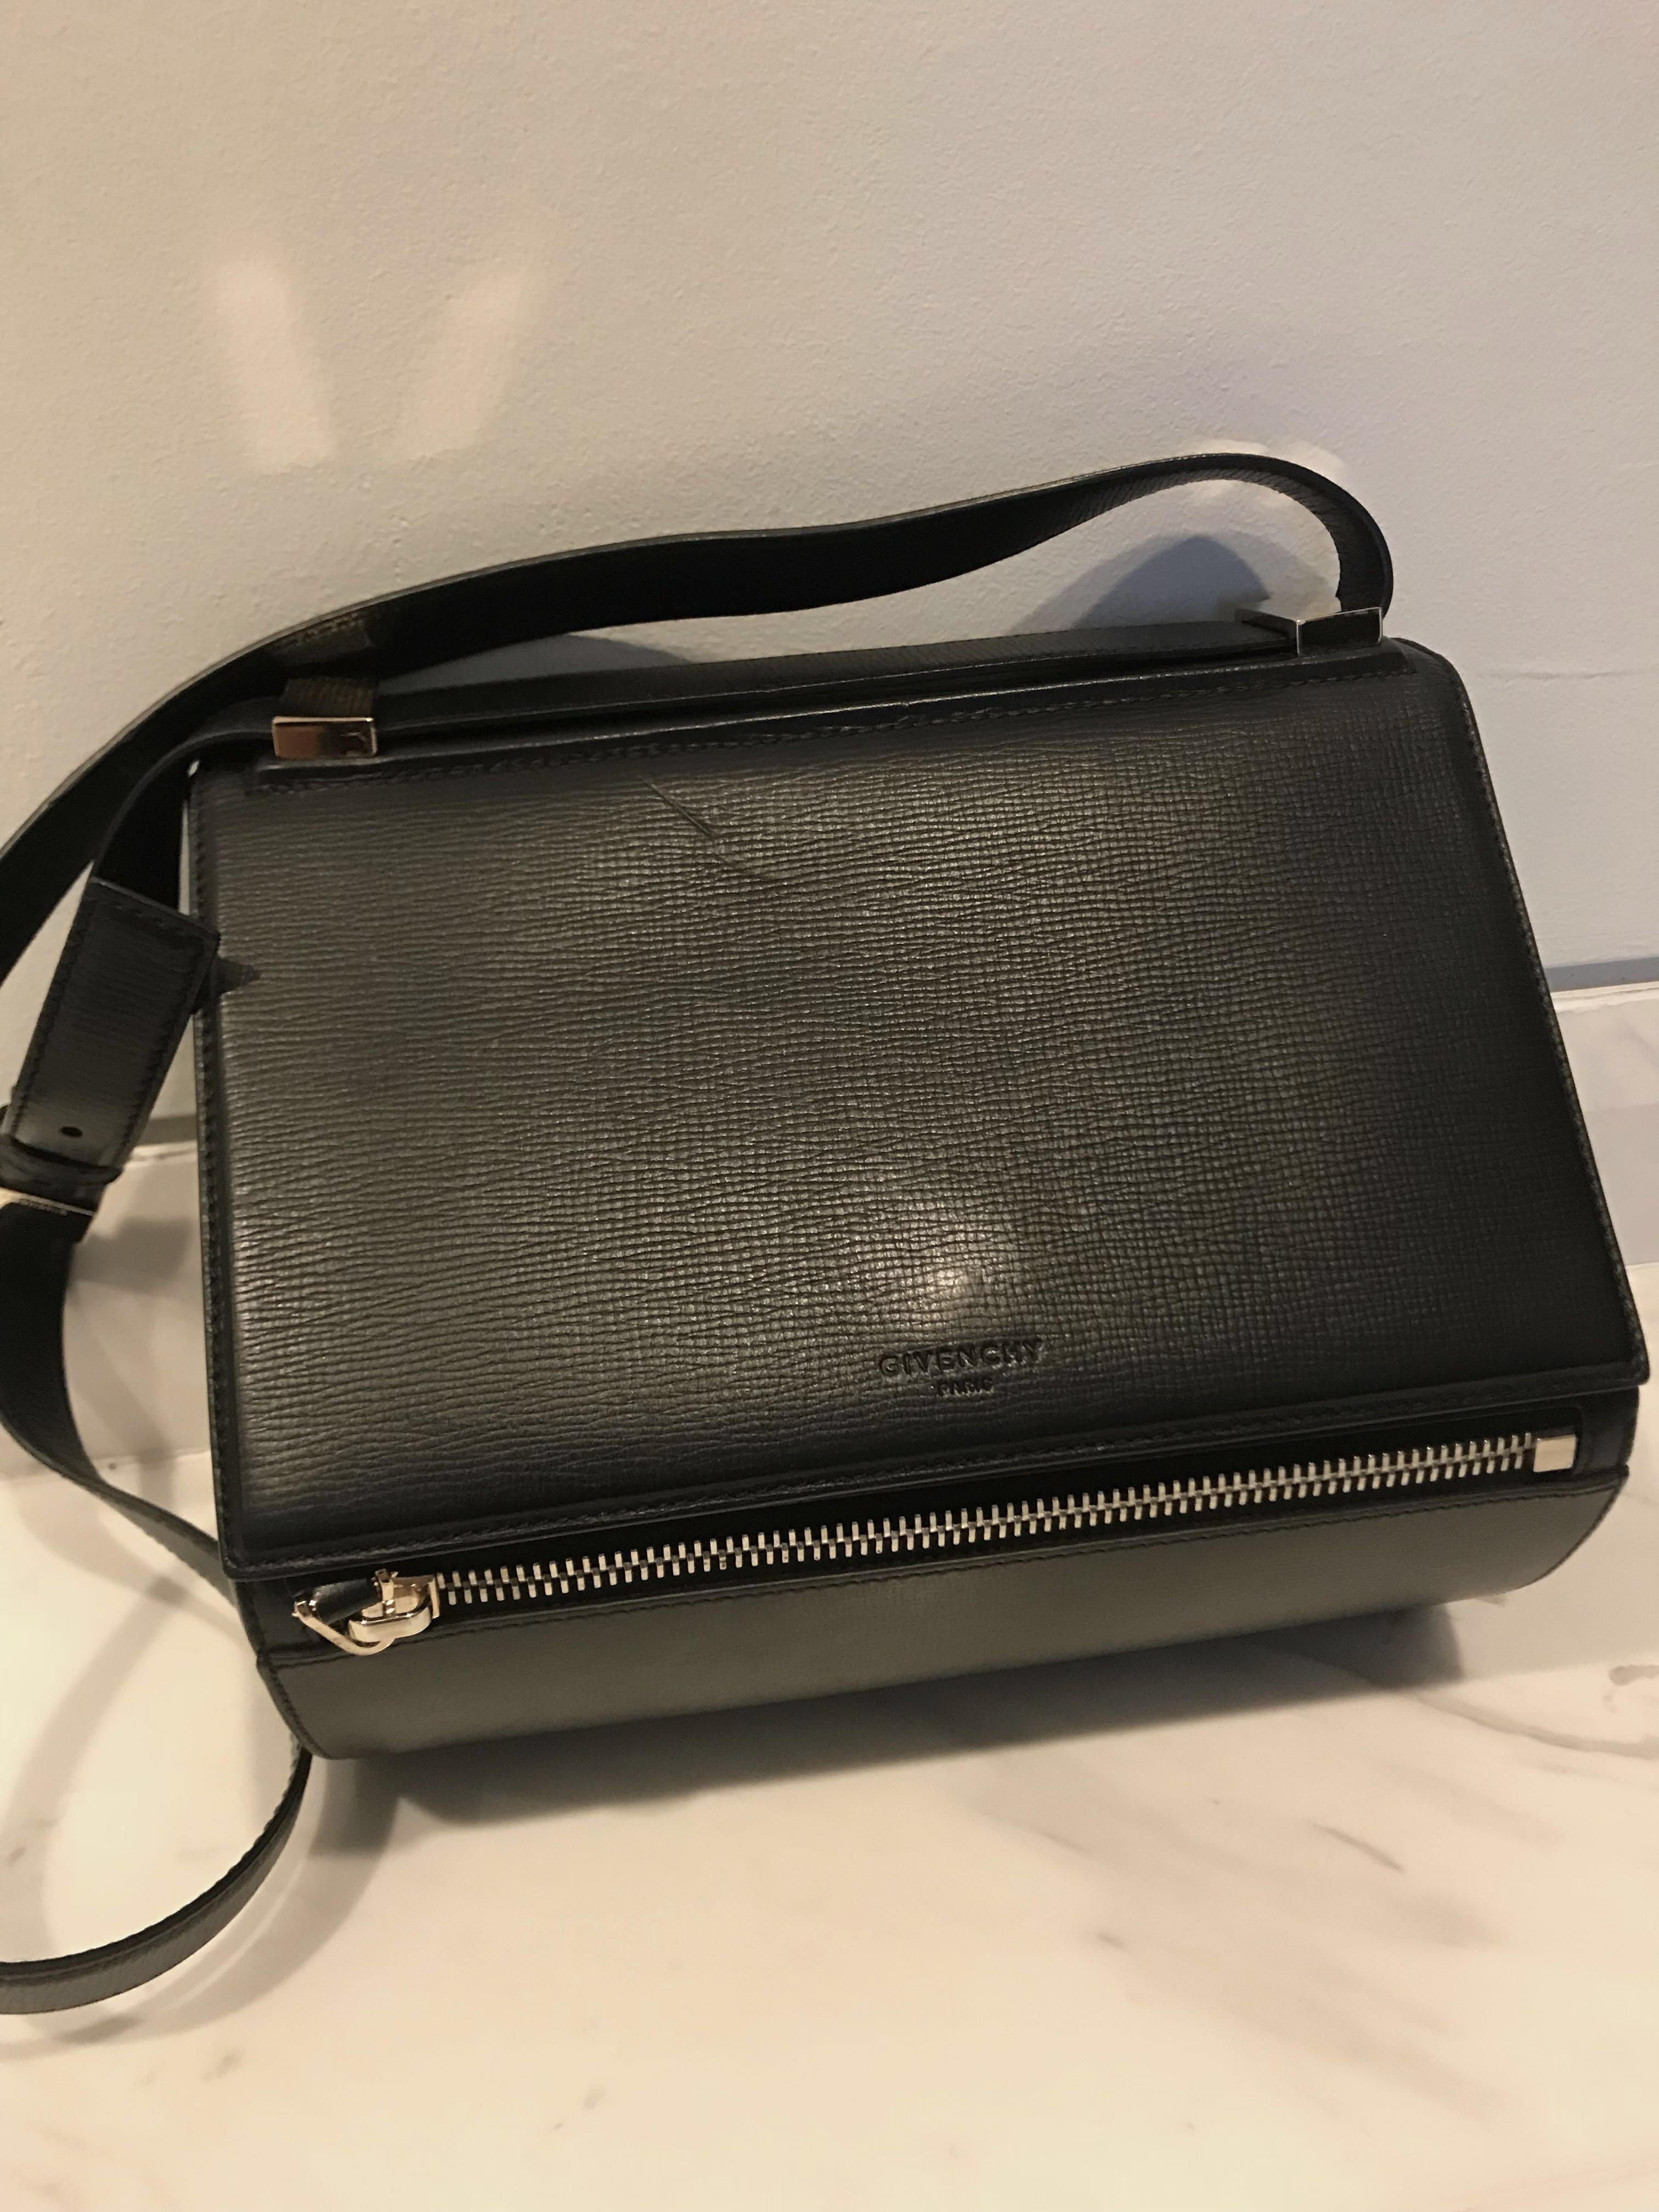 cf0b838cdb7 Home · Women's Fashion · Bags & Wallets · Handbags. photo photo photo photo  photo